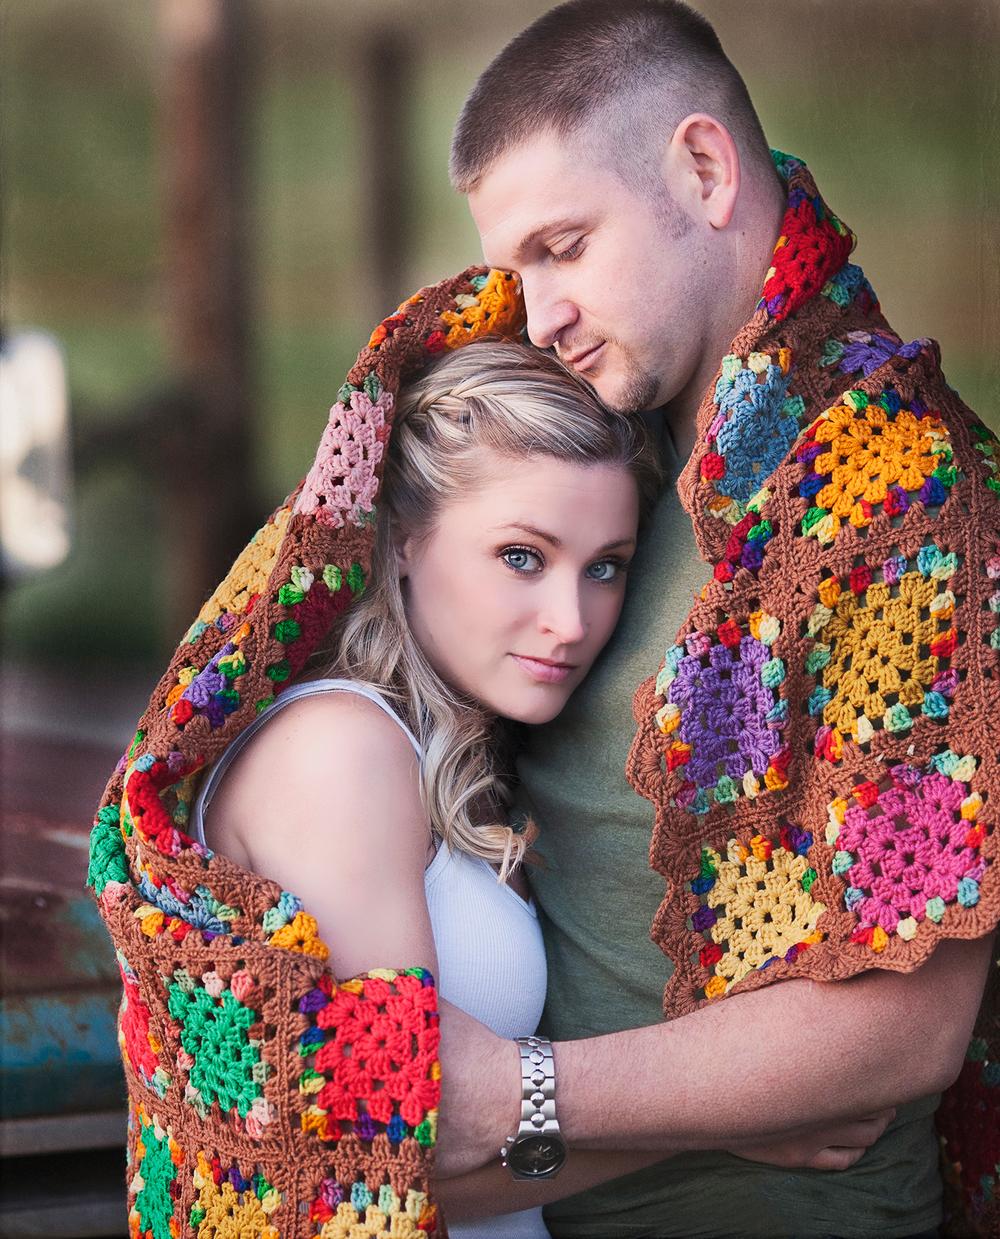 Dena_Rooney_Wedding_Photographer_Engagement_Photos_014.jpg